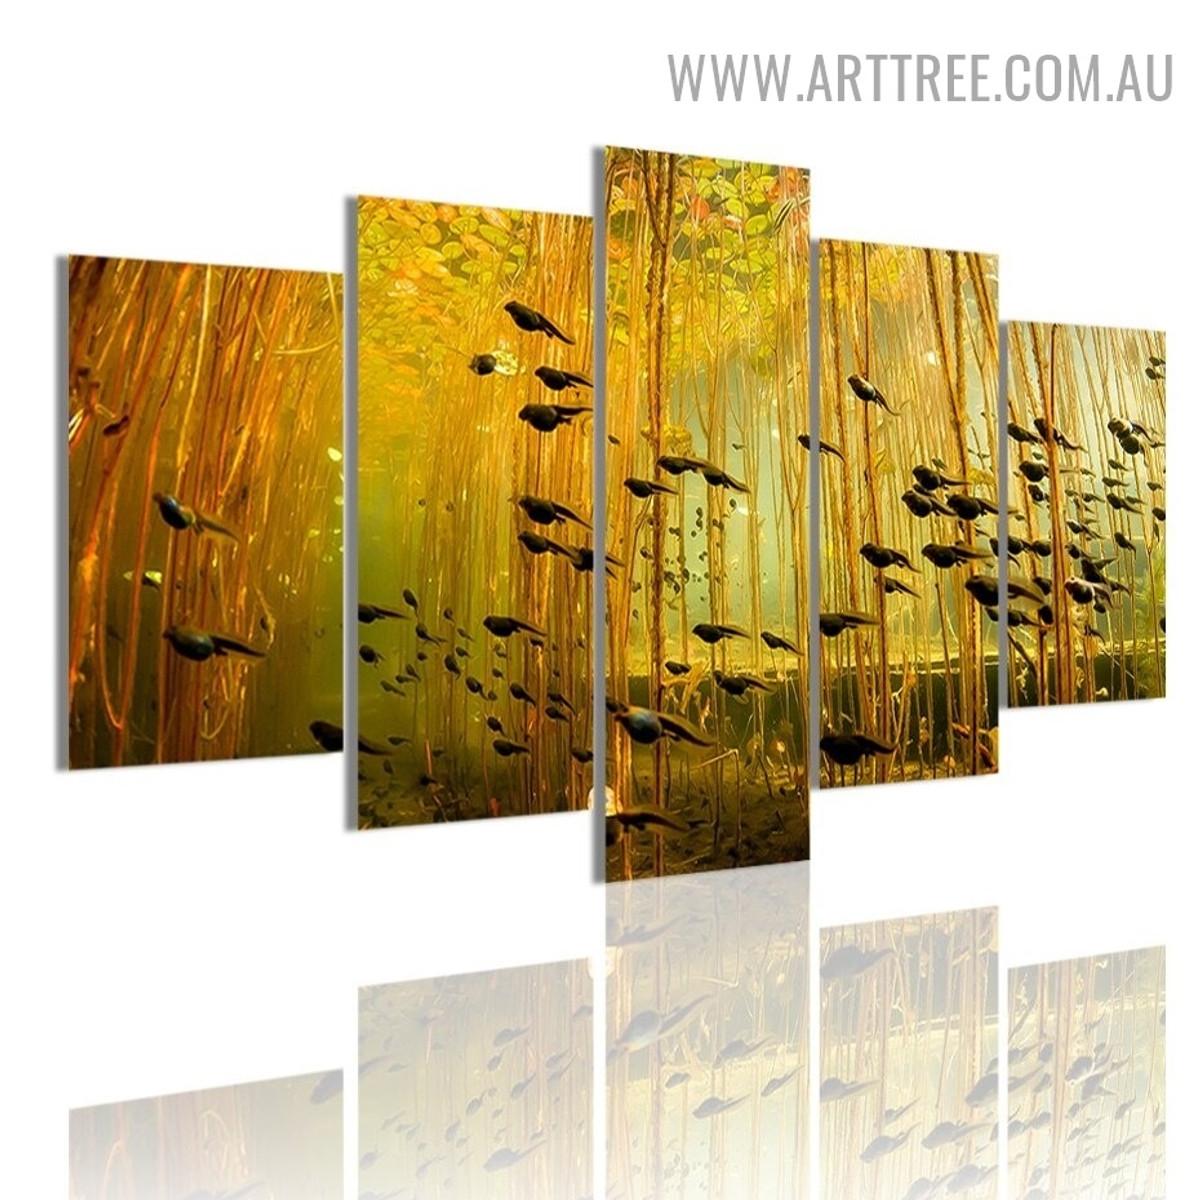 Swim Tadpoles Trees Animal Modern 5 Piece Split Wall Art Image Canvas Print for Room Trimming